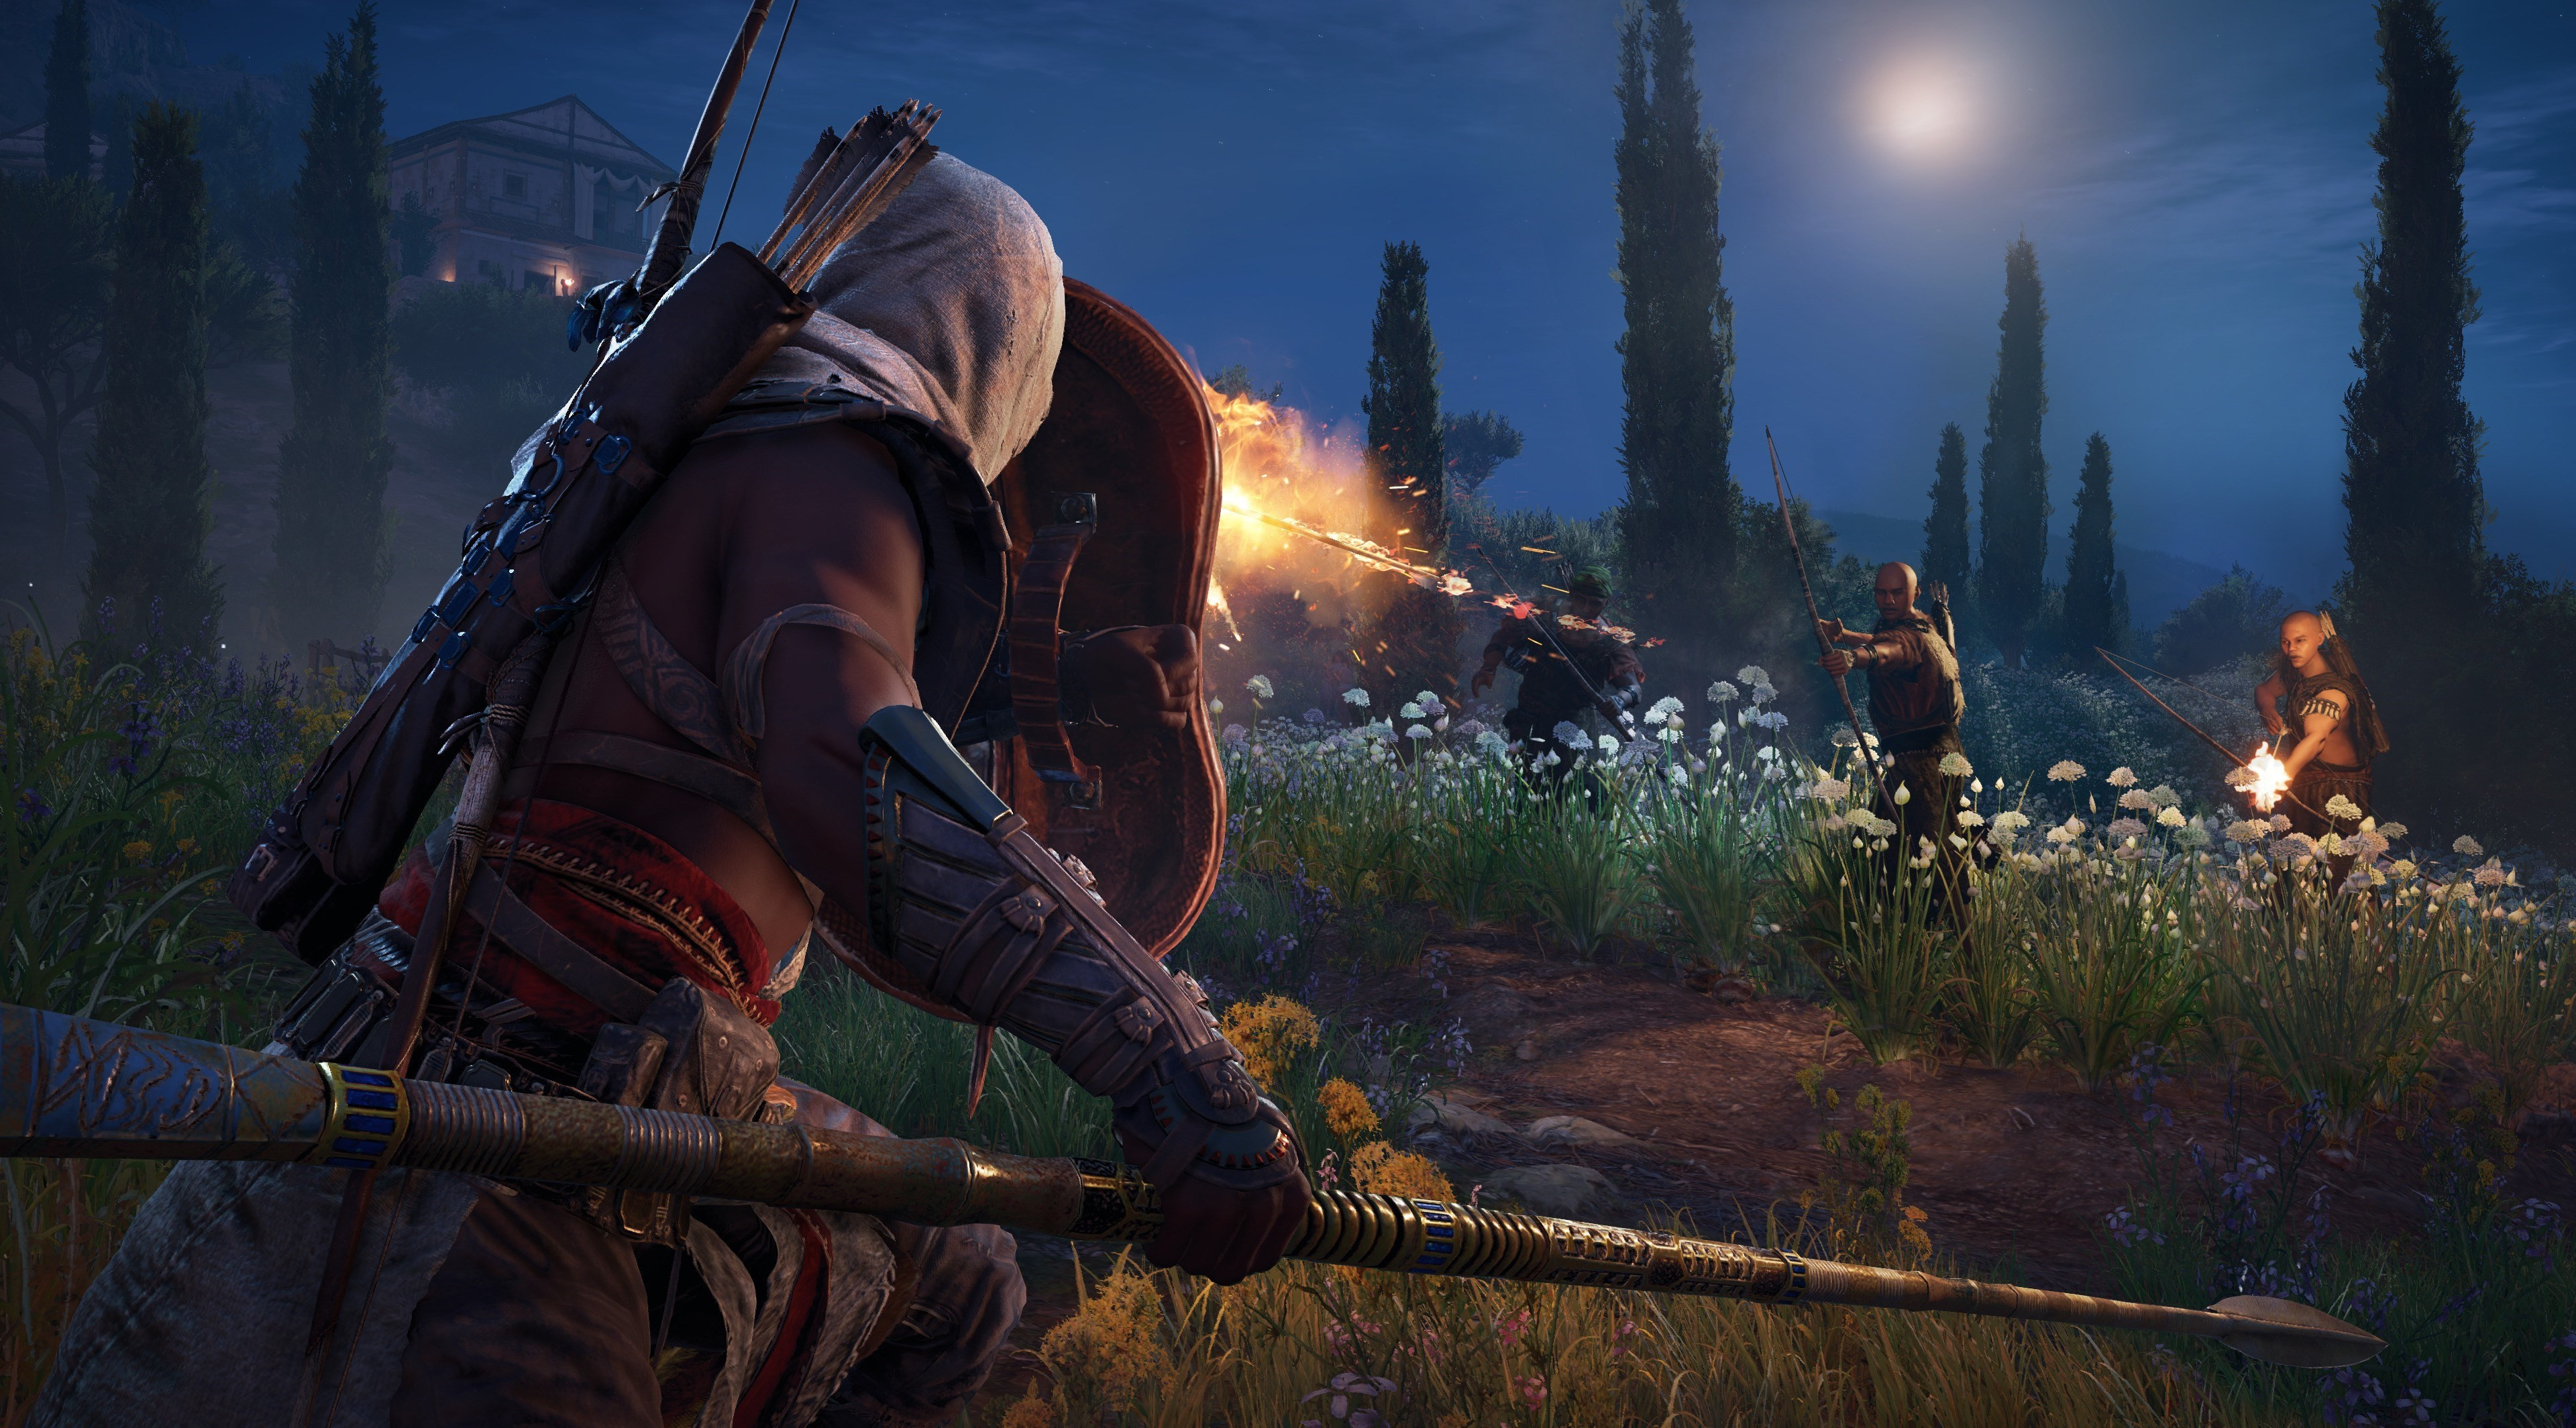 Assassin S Creed Origins Wallpaper 2178988 Zerochan Anime